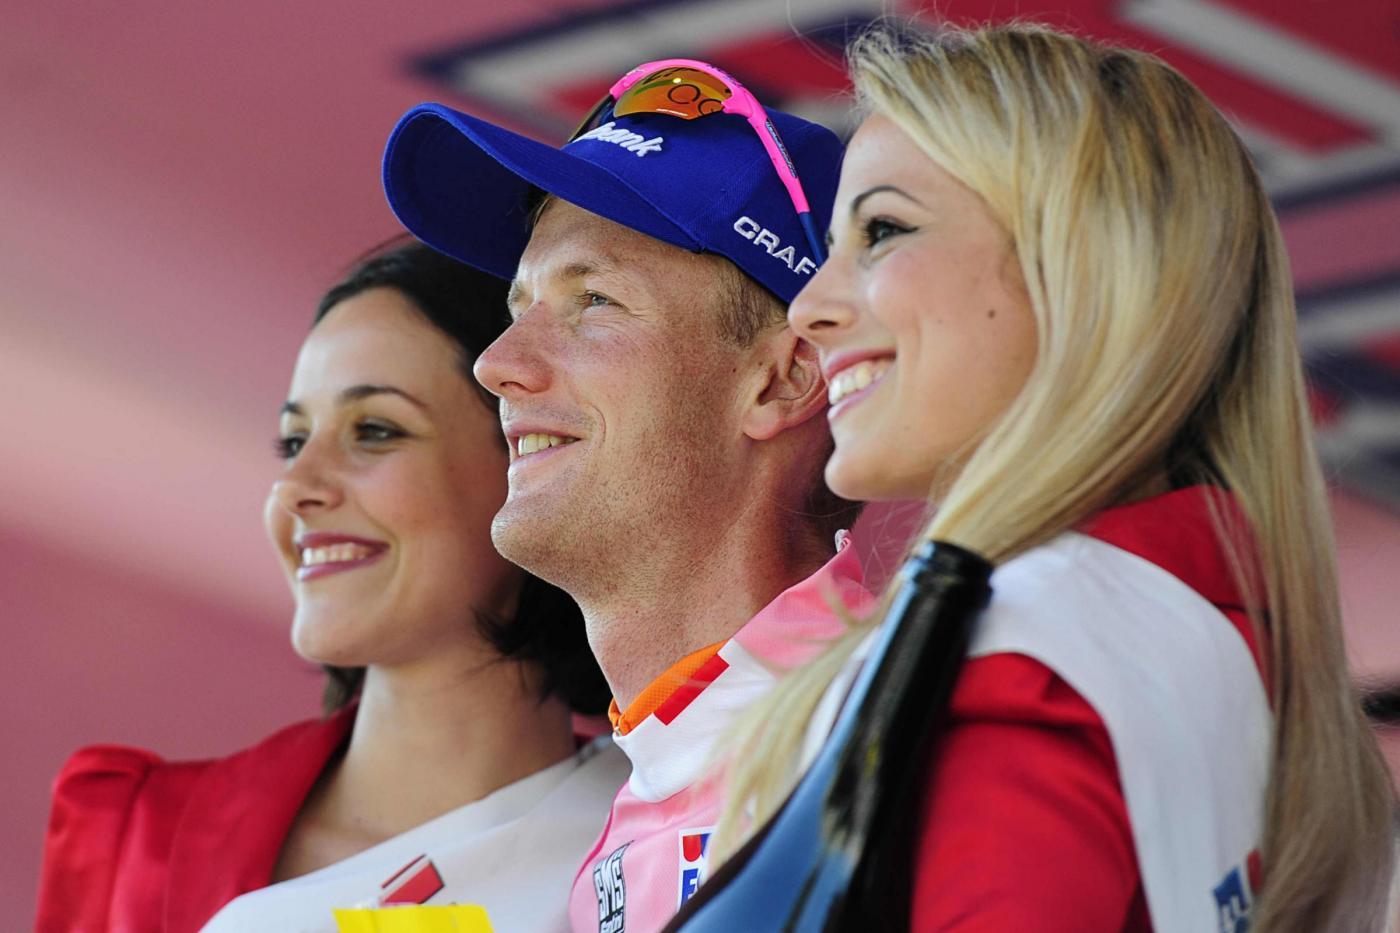 Giro d'Italia 2014: Weening esulta a Sestola, grande Pozzovivo